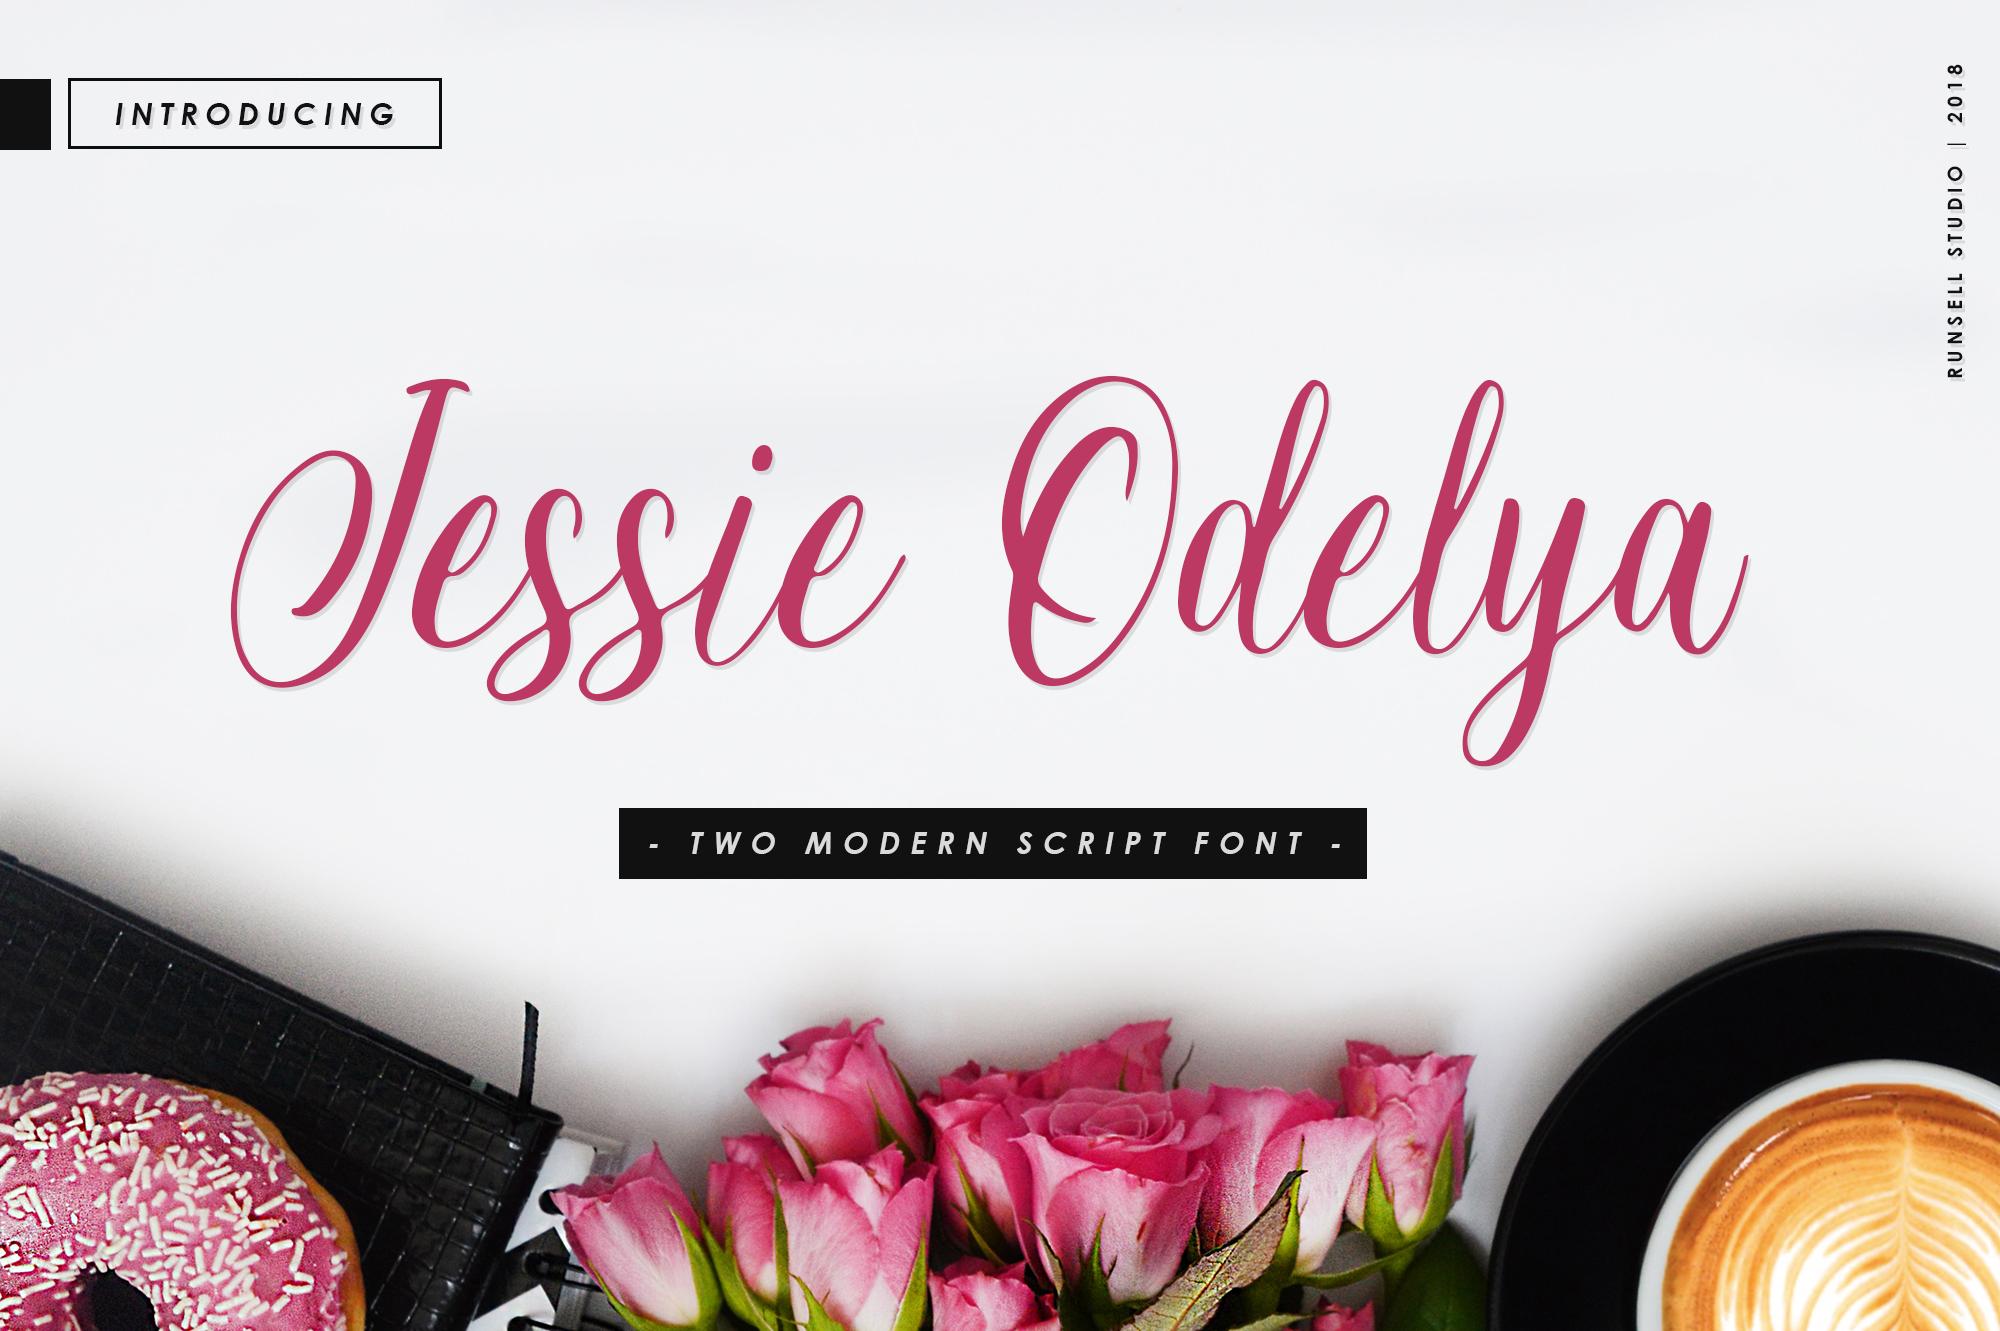 Jessie Odelya example image 1